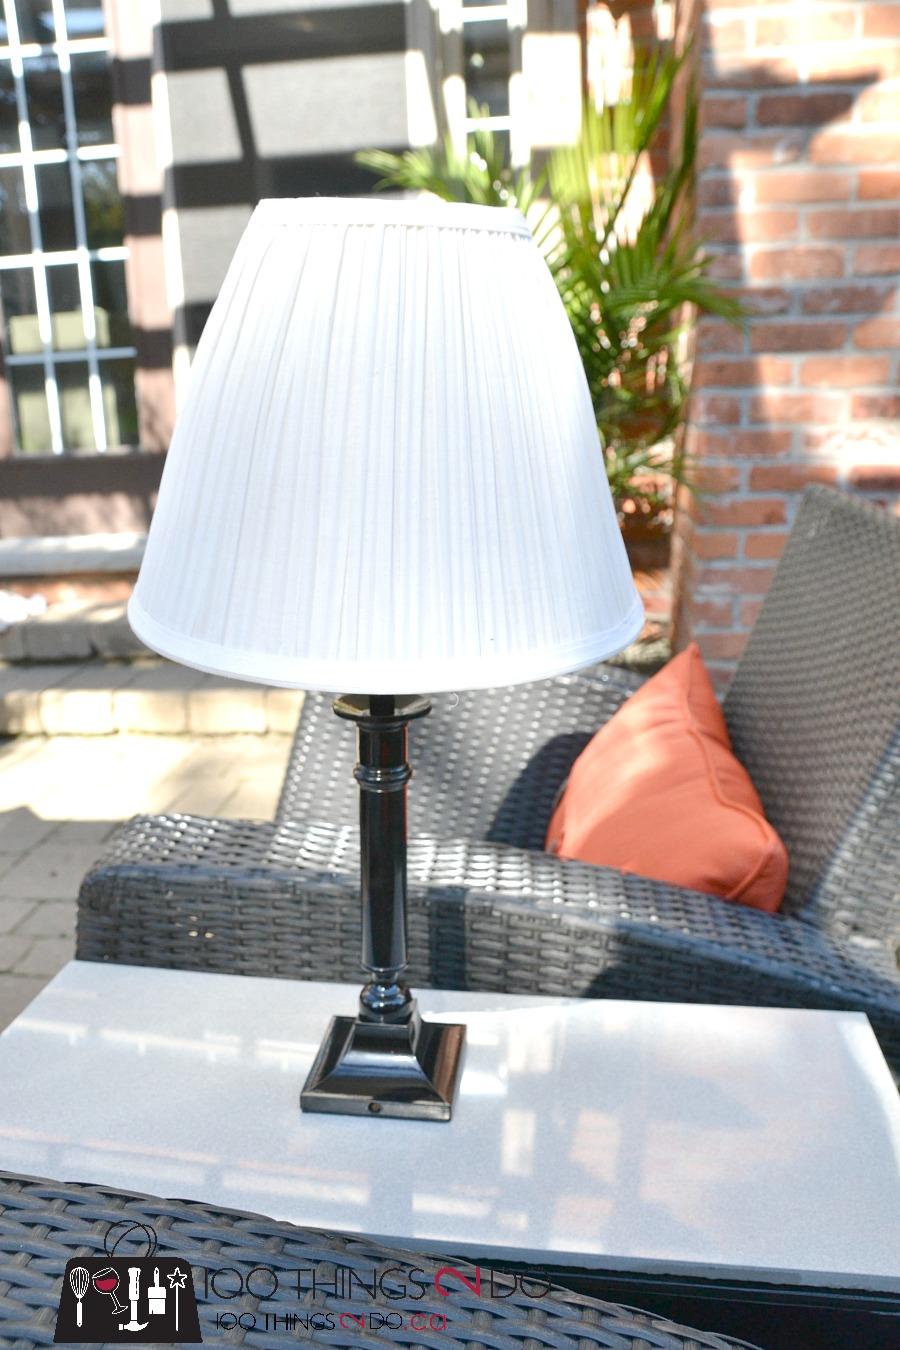 Outdoor Lighting Diy Solar Lamp 100 Things 2 Do